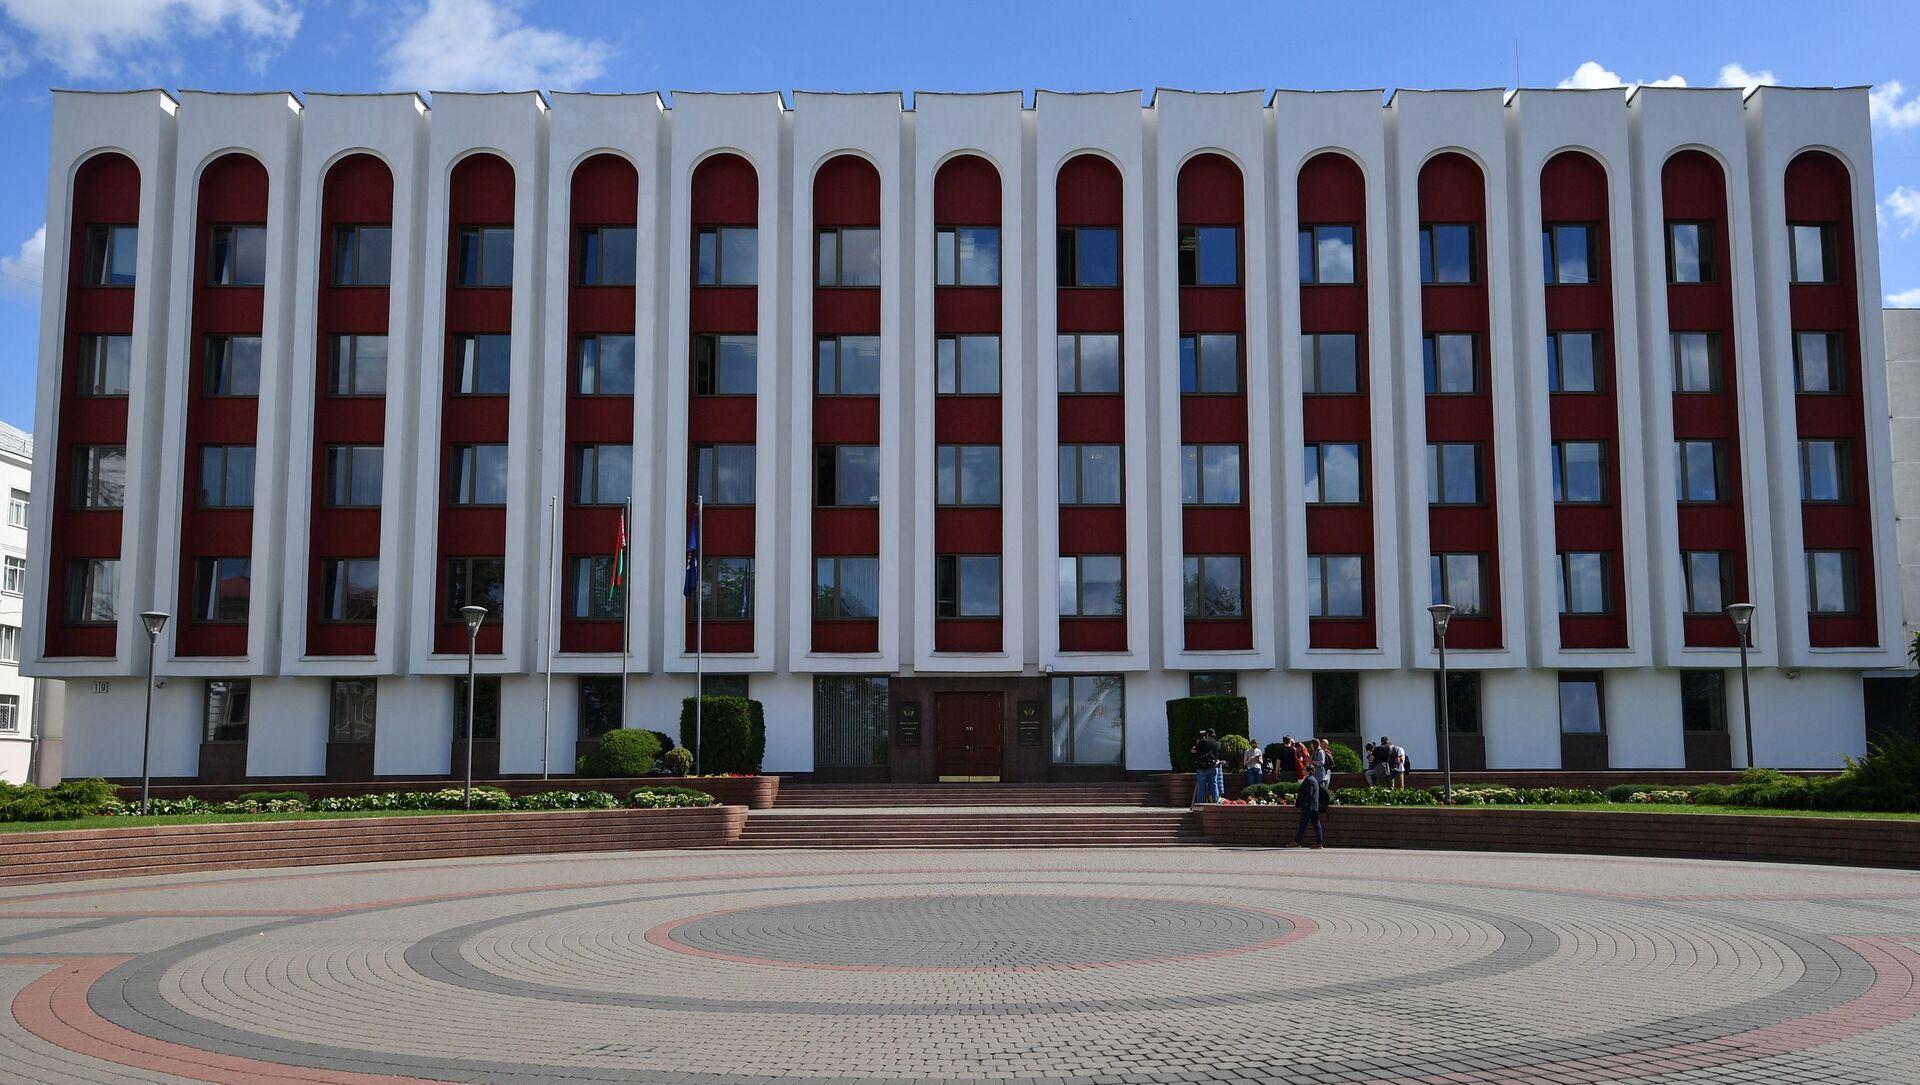 МИД Беларуси - Sputnik Грузия, 1920, 06.04.2021